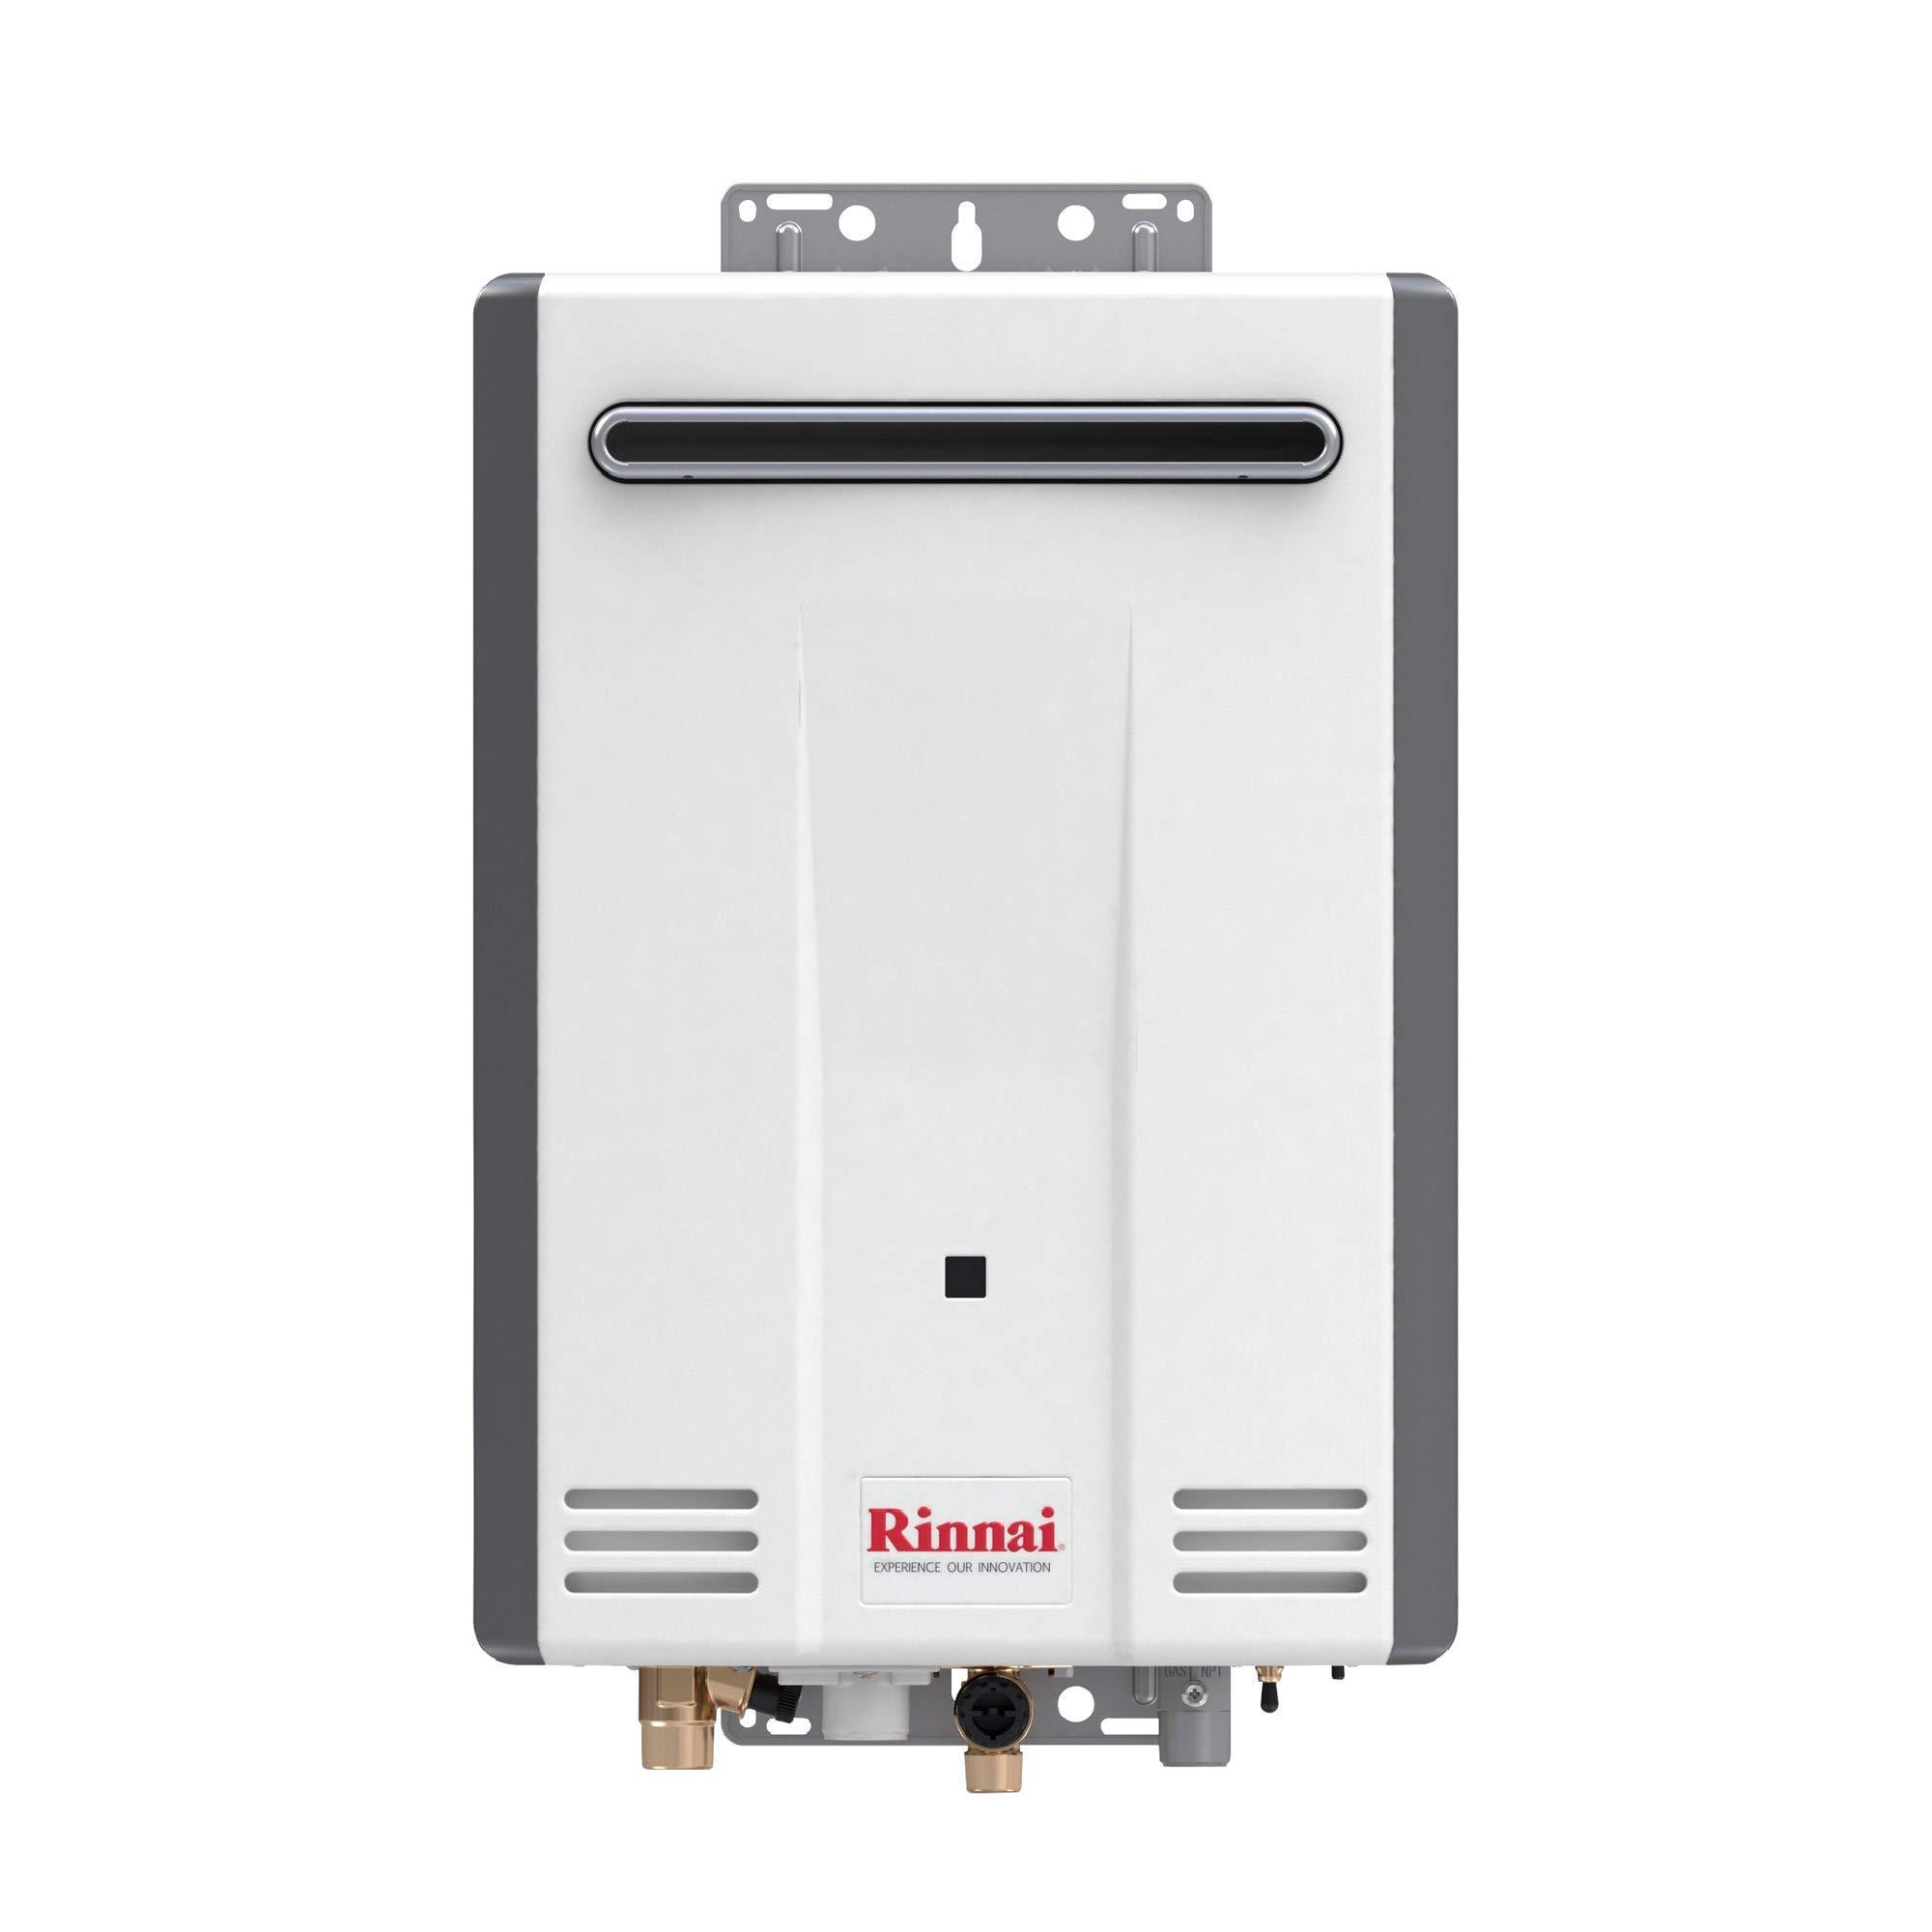 Rinnai V53DeP Tankless Water Heaters